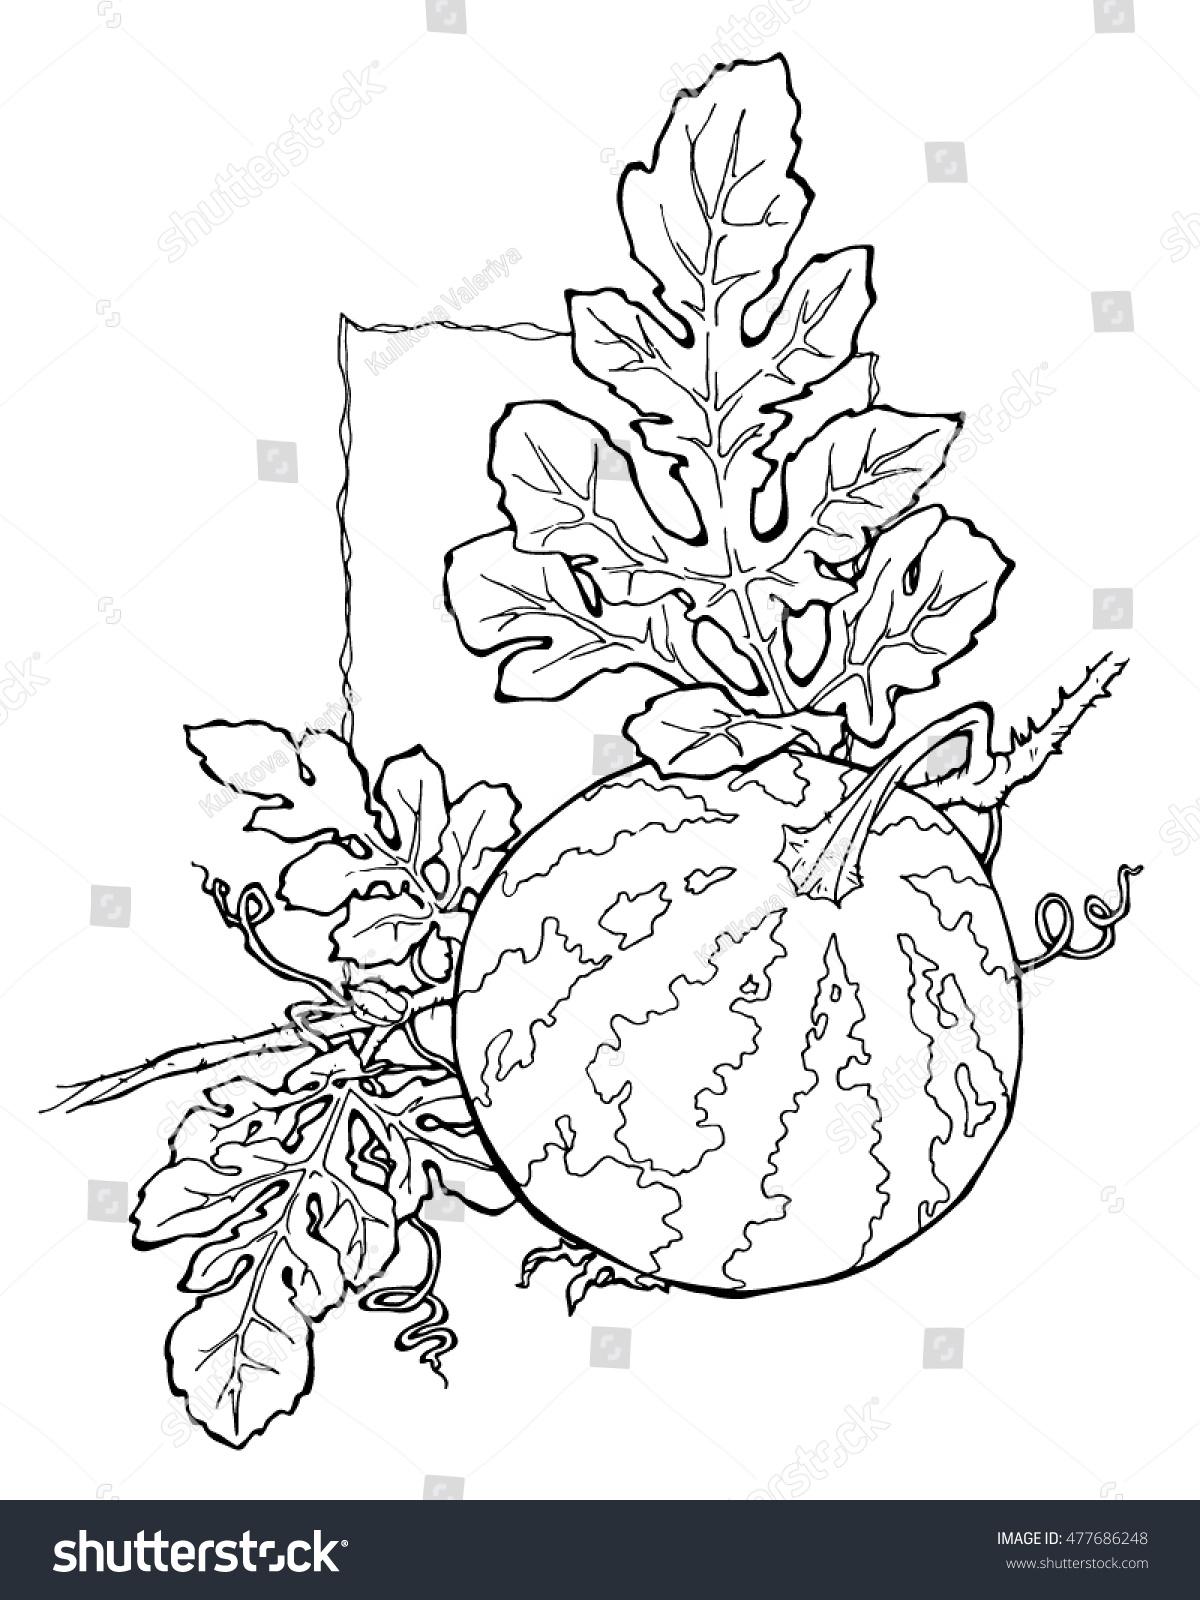 watermelon coloring page - Watermelon Coloring Page